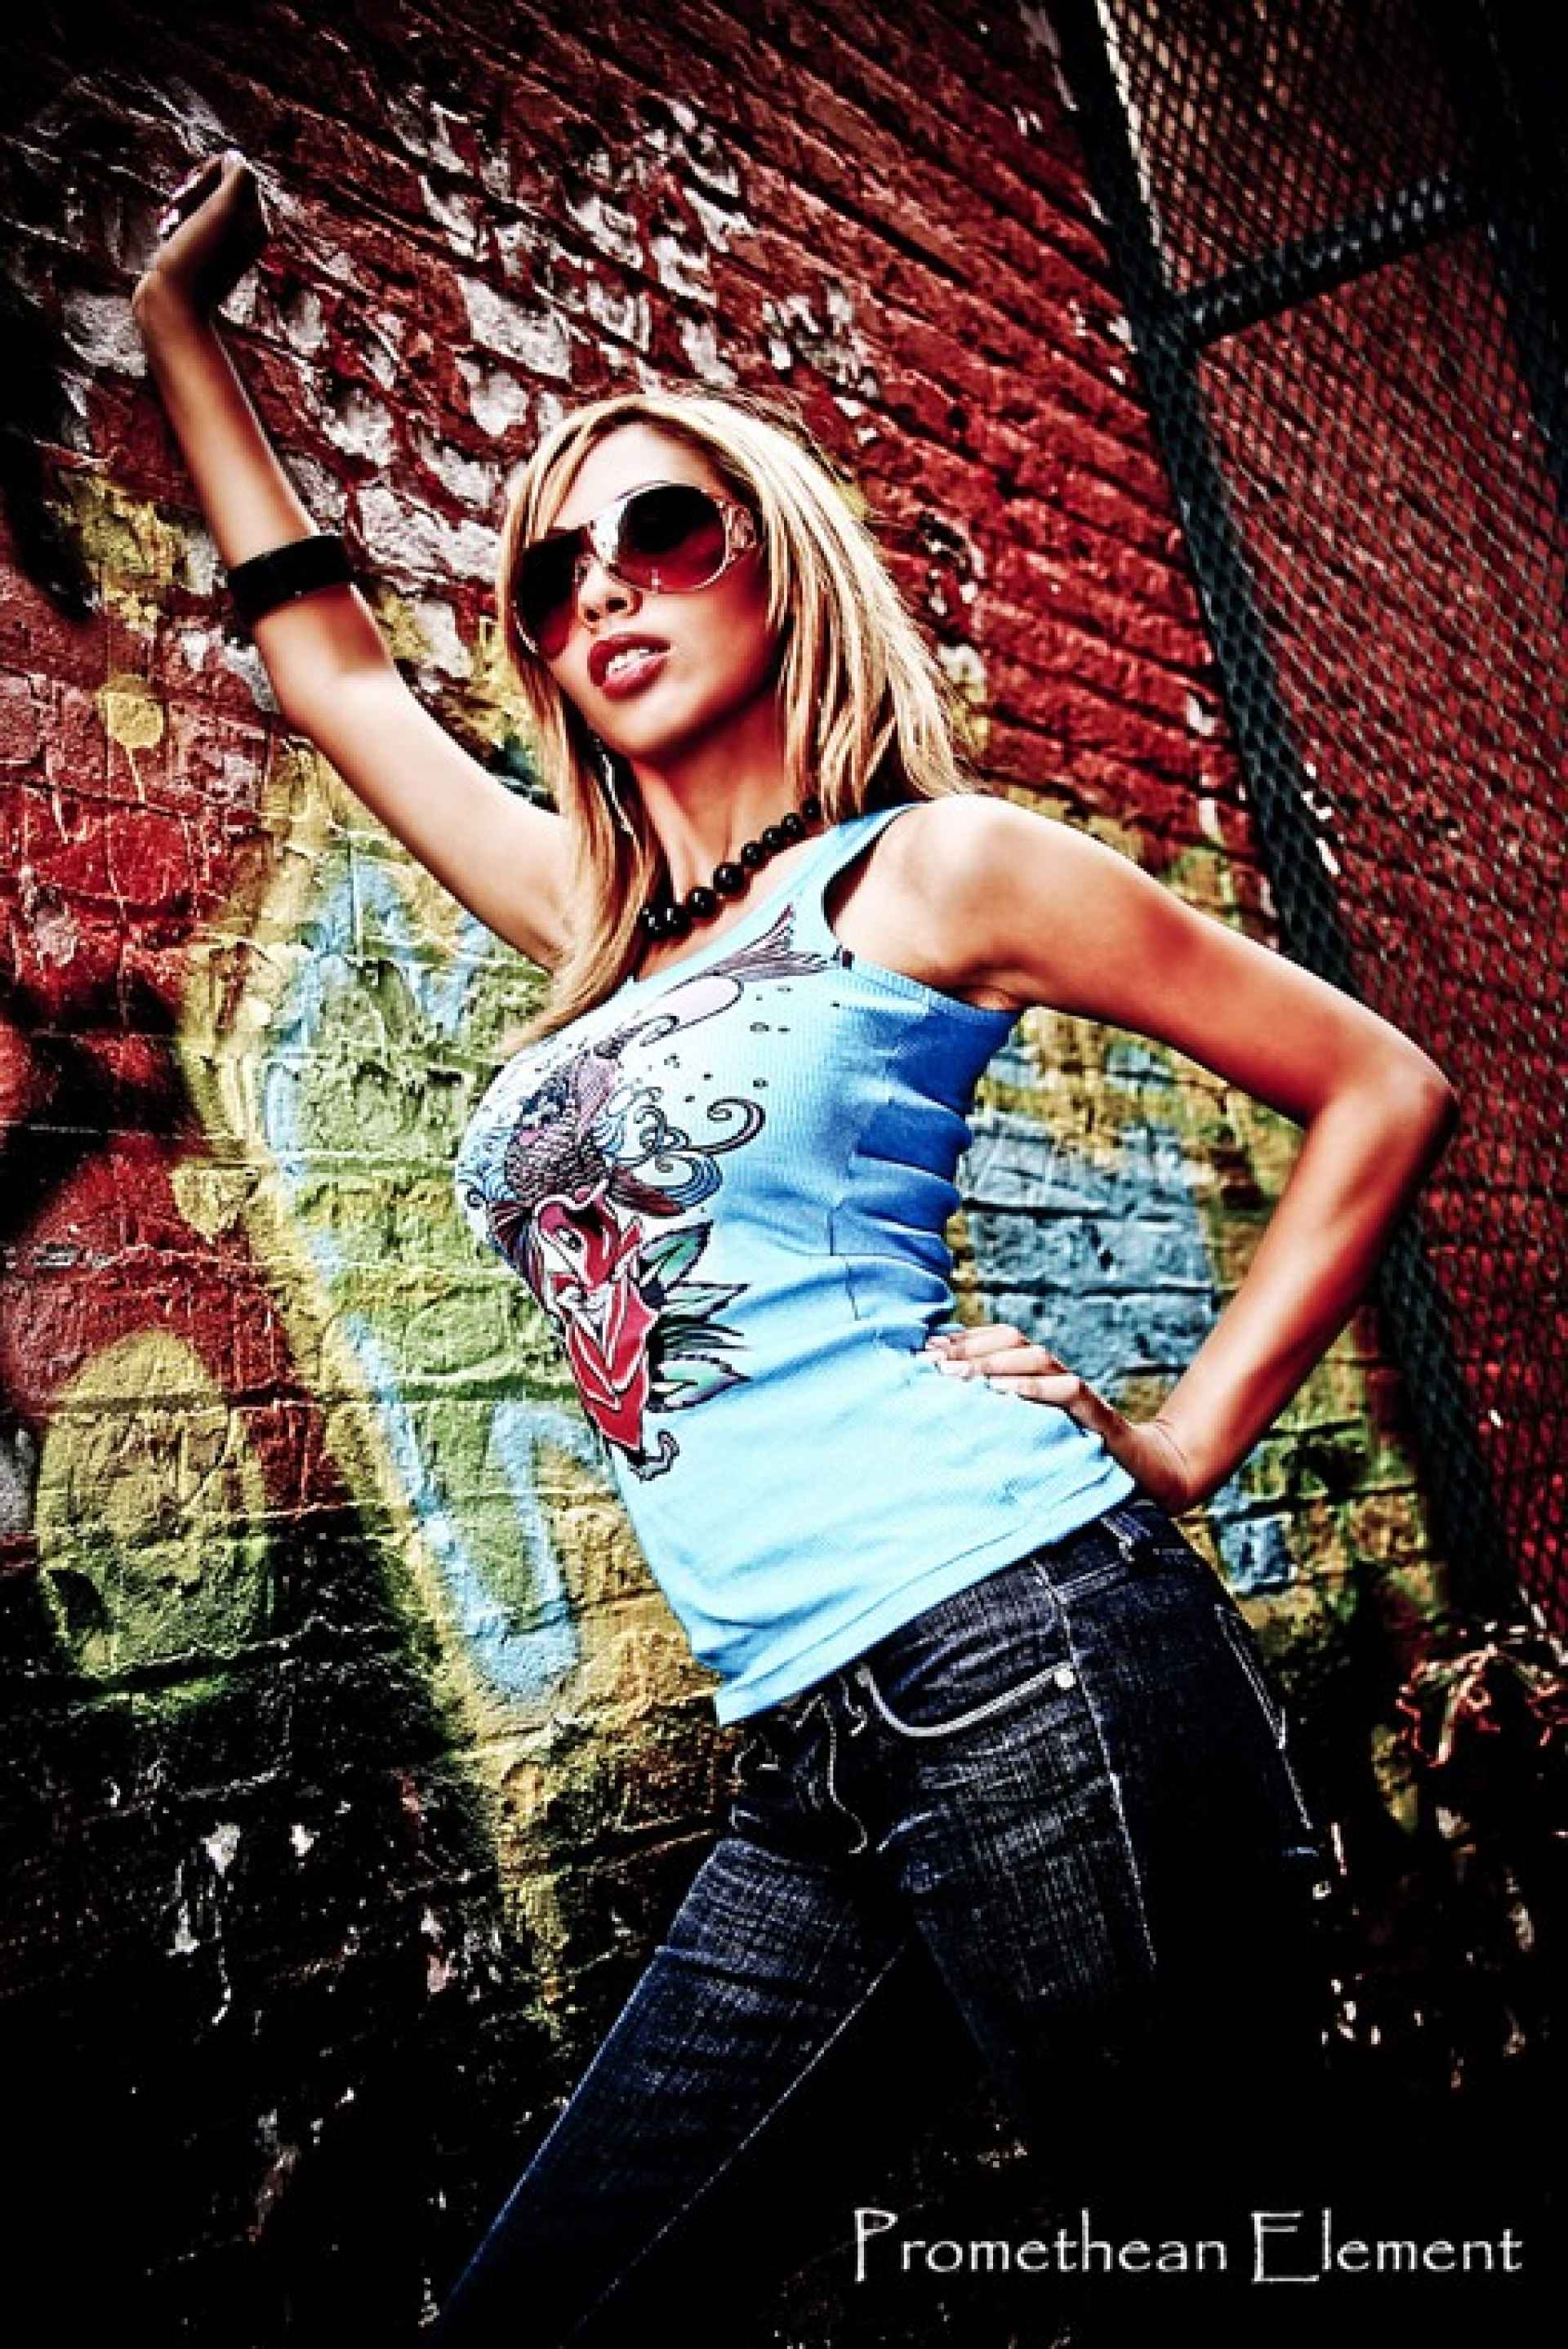 SDC ASN Lifestyle Magazine Sabrina LStyle Media Social Swingers Influential Women Promethean Element Photography